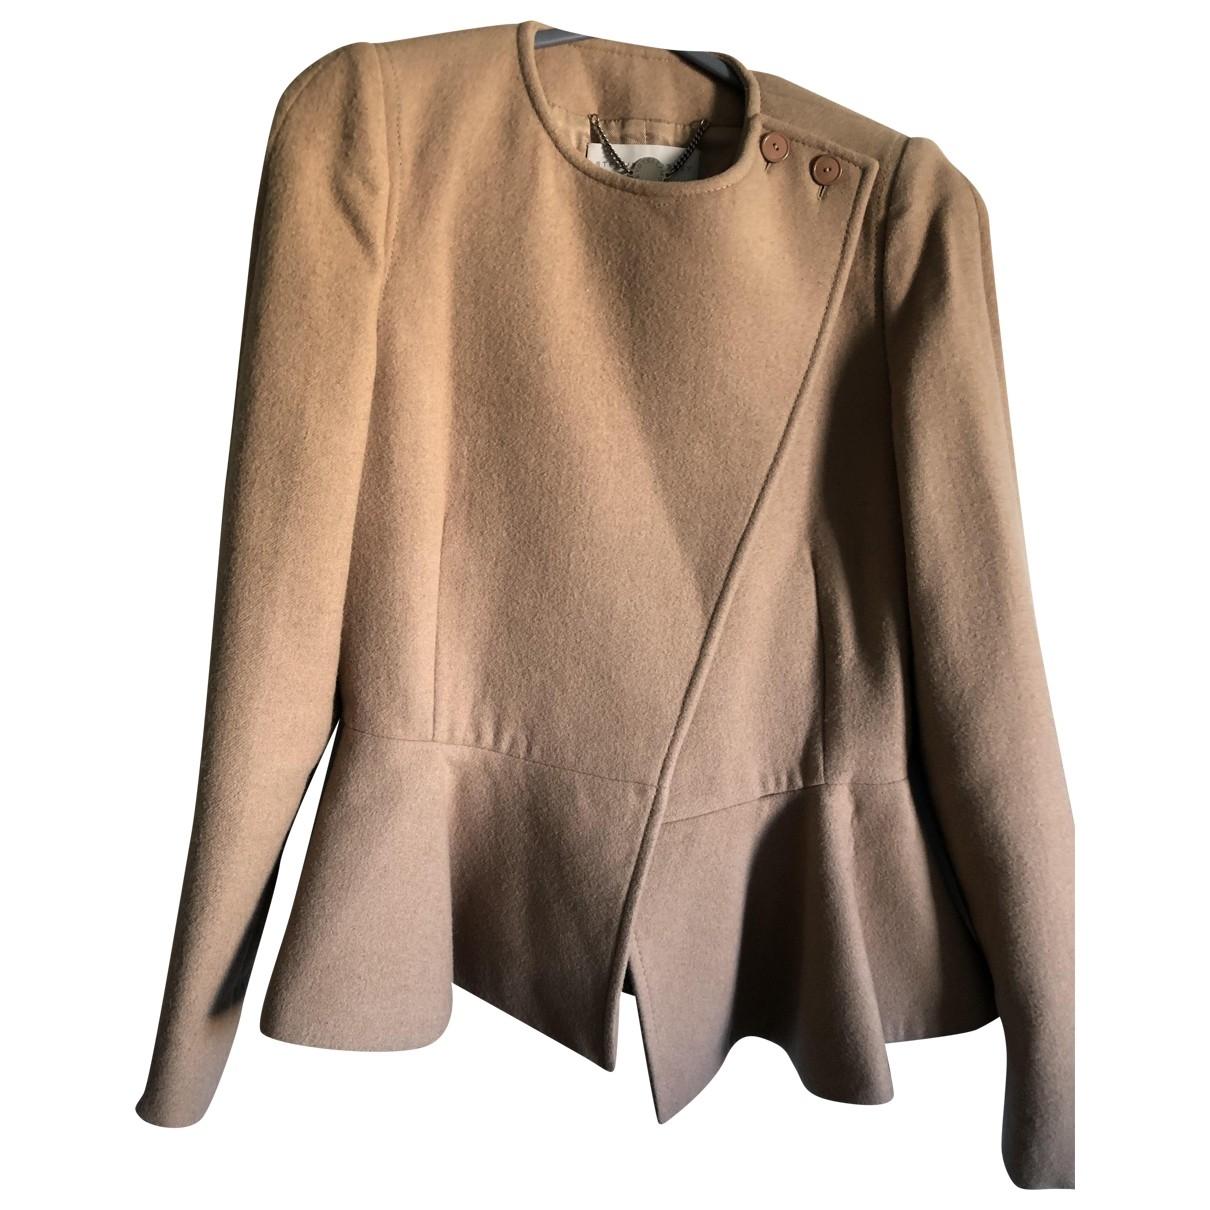 Stella Mccartney \N Camel Wool jacket for Women 40 FR